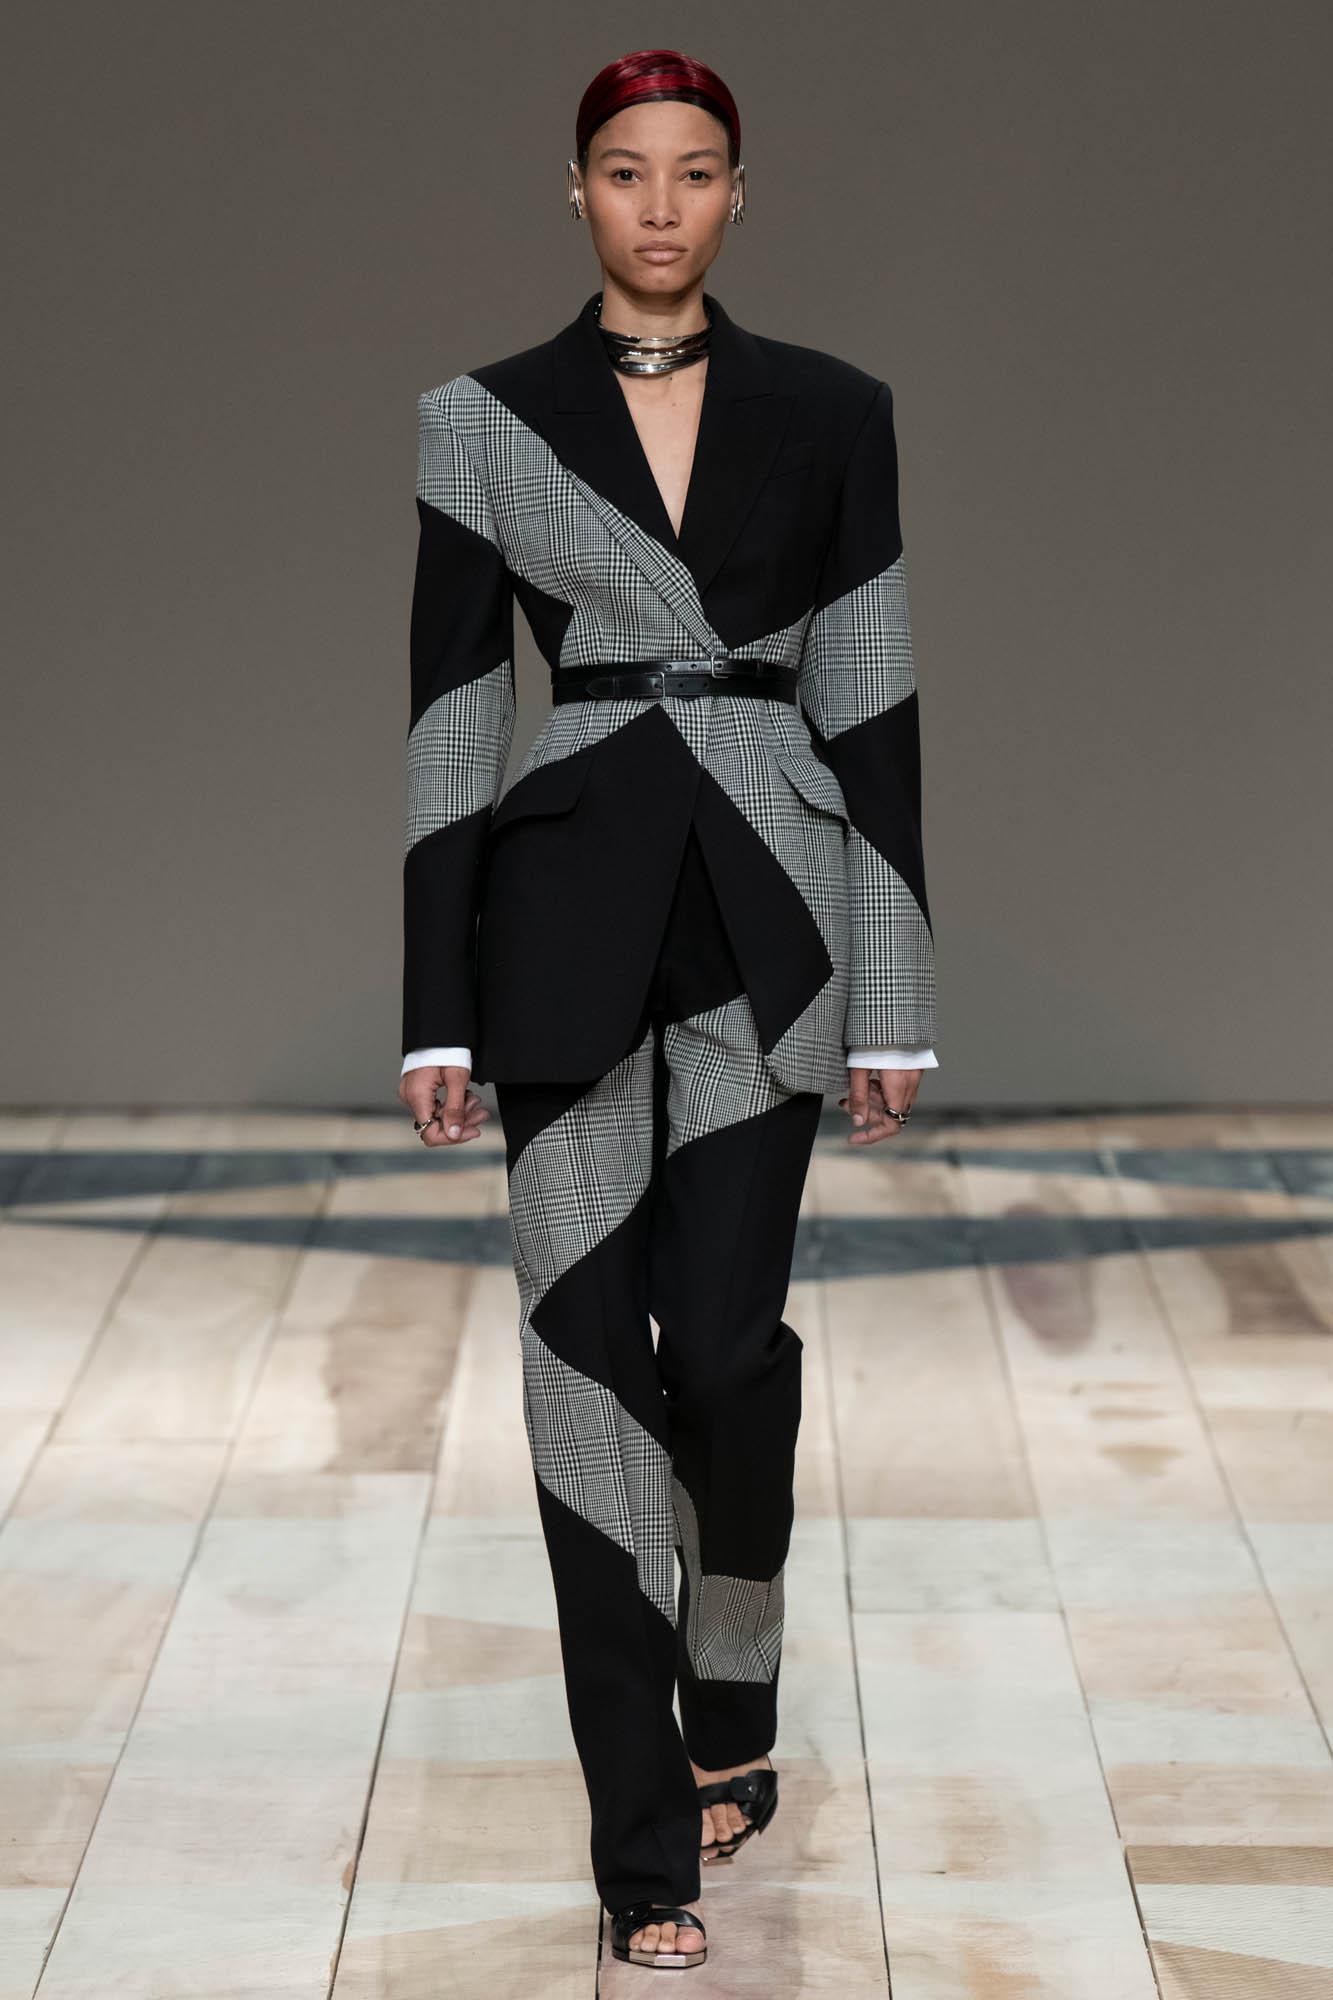 Alexander McQueen Fall Winter 2020 Womens Collection Paris Fashion Week